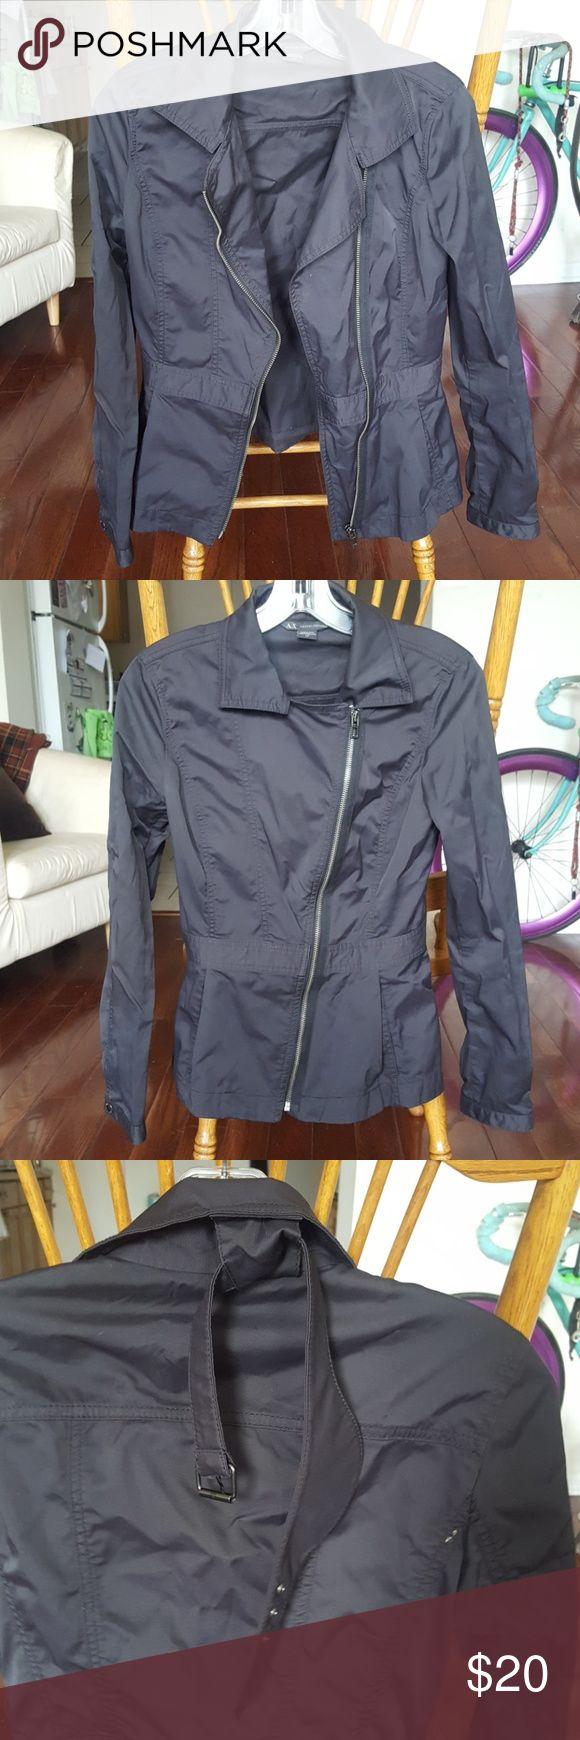 Armani Exchange Coat 49% cotton, 48% Nylon, 3% Spandex. Light bodied. Armani Exchange Jackets & Coats